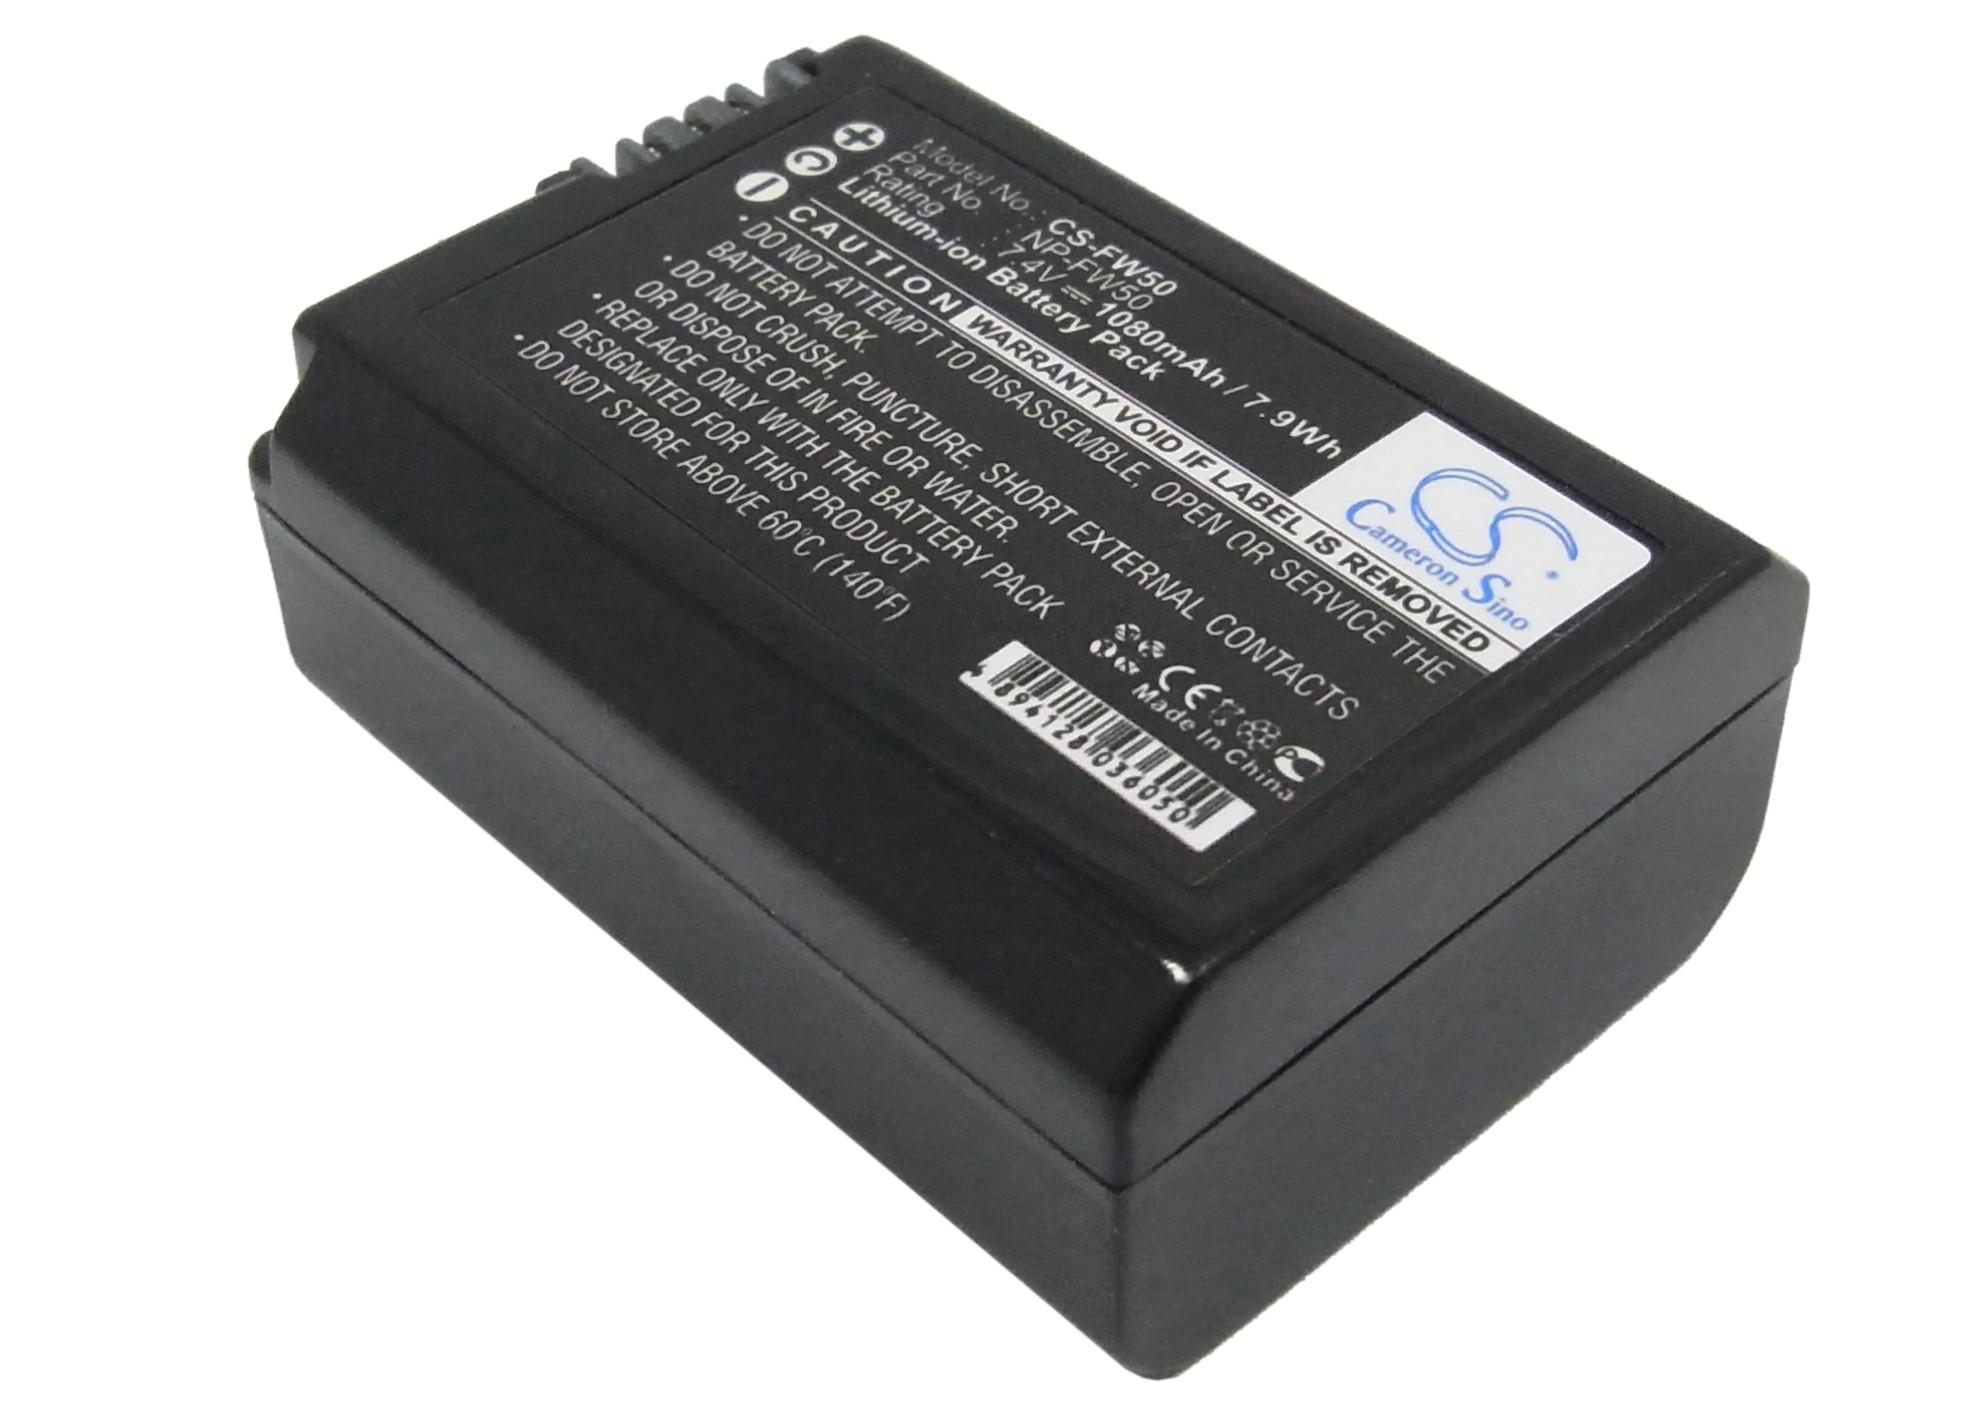 Cameron Sino baterie do kamer a fotoaparátů pro SONY NEX-5R 7.4V Li-ion 1080mAh černá - neoriginální